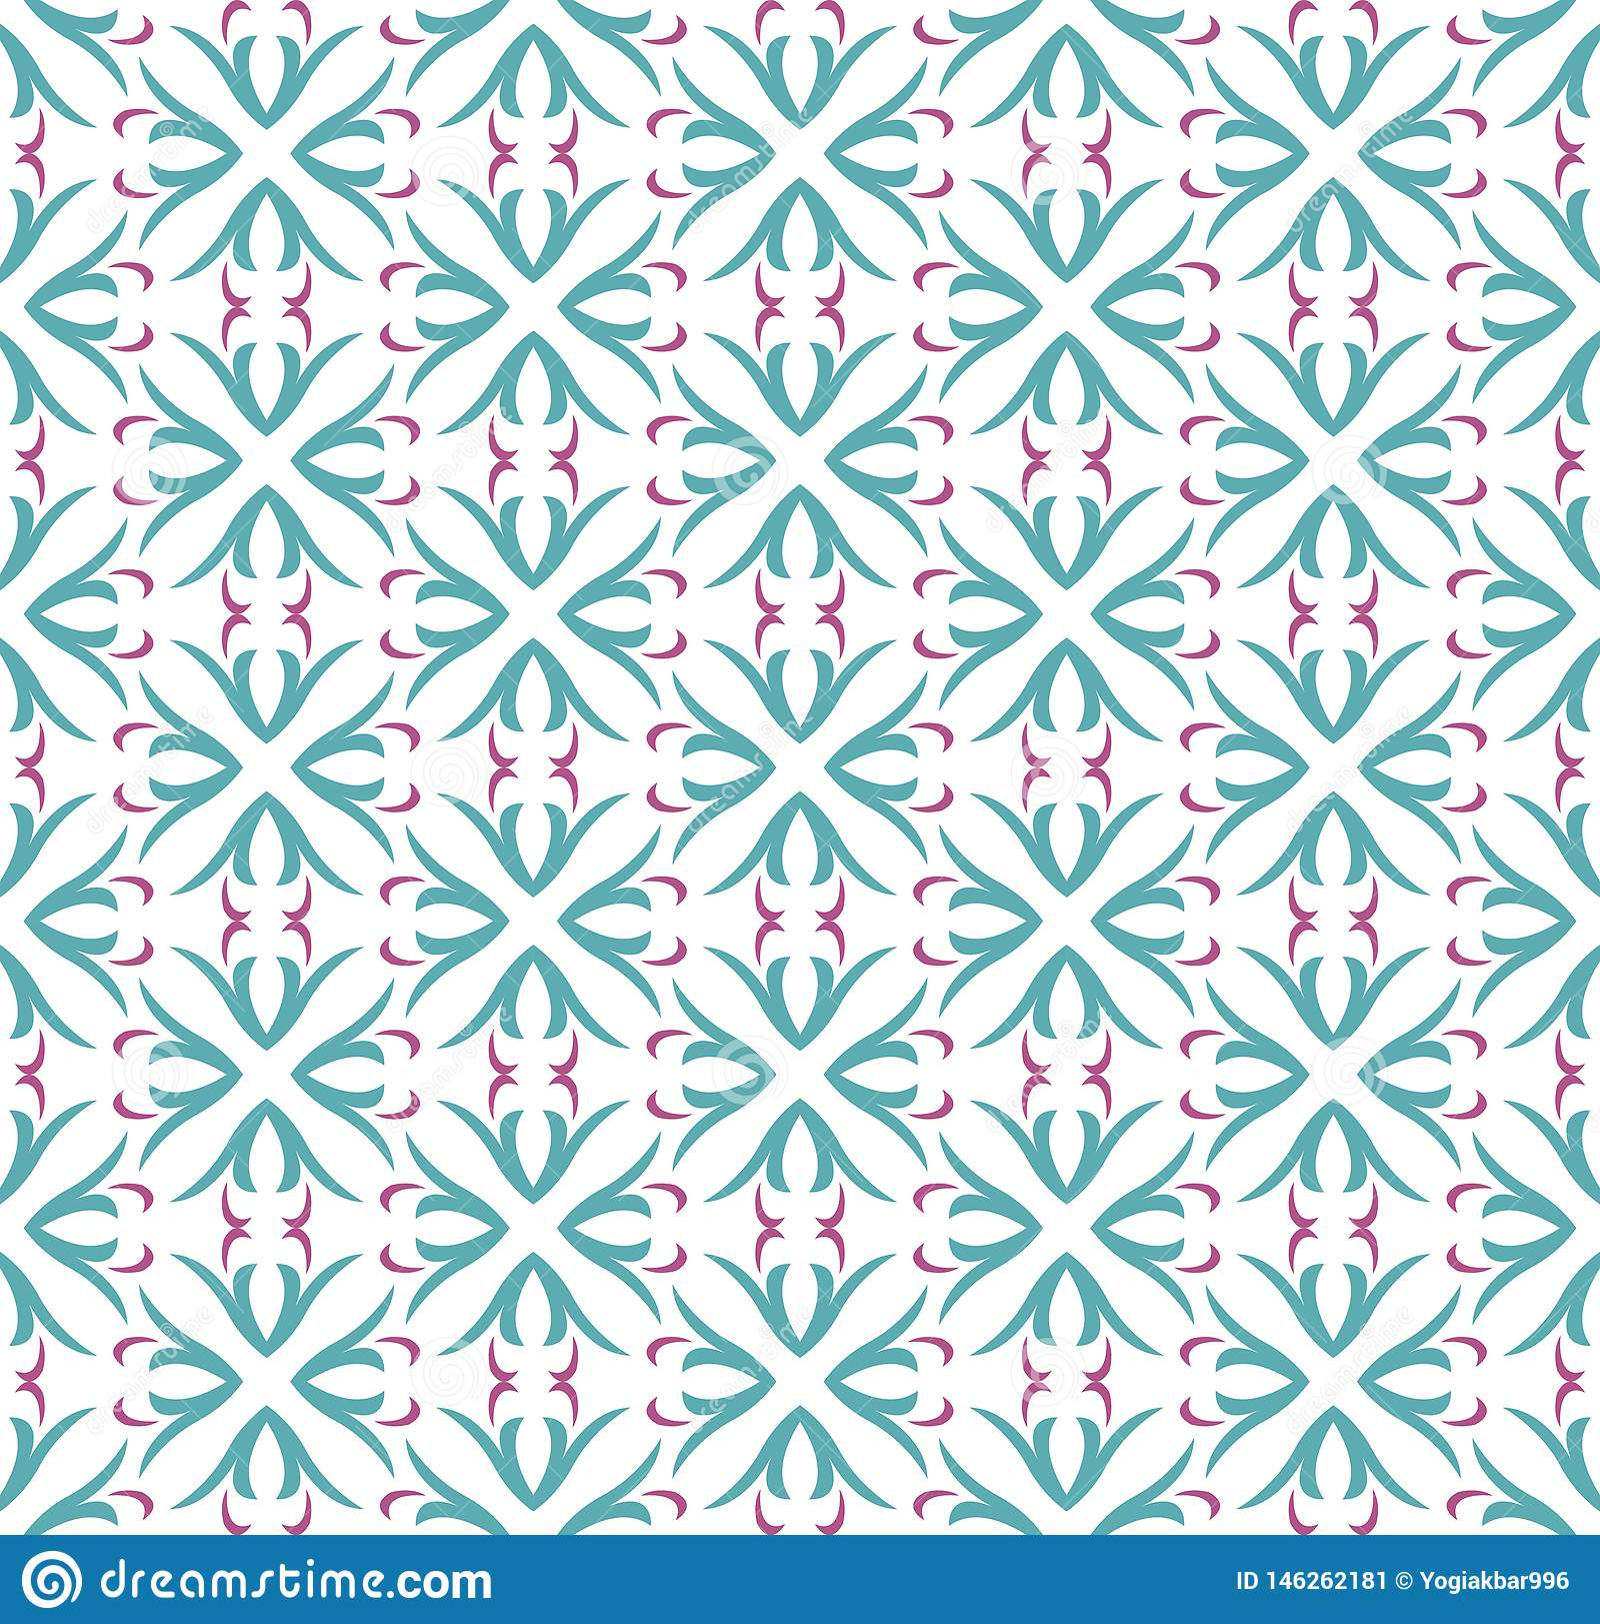 Naadloos abstract bloemenpatroon symmetrie moderne stijl